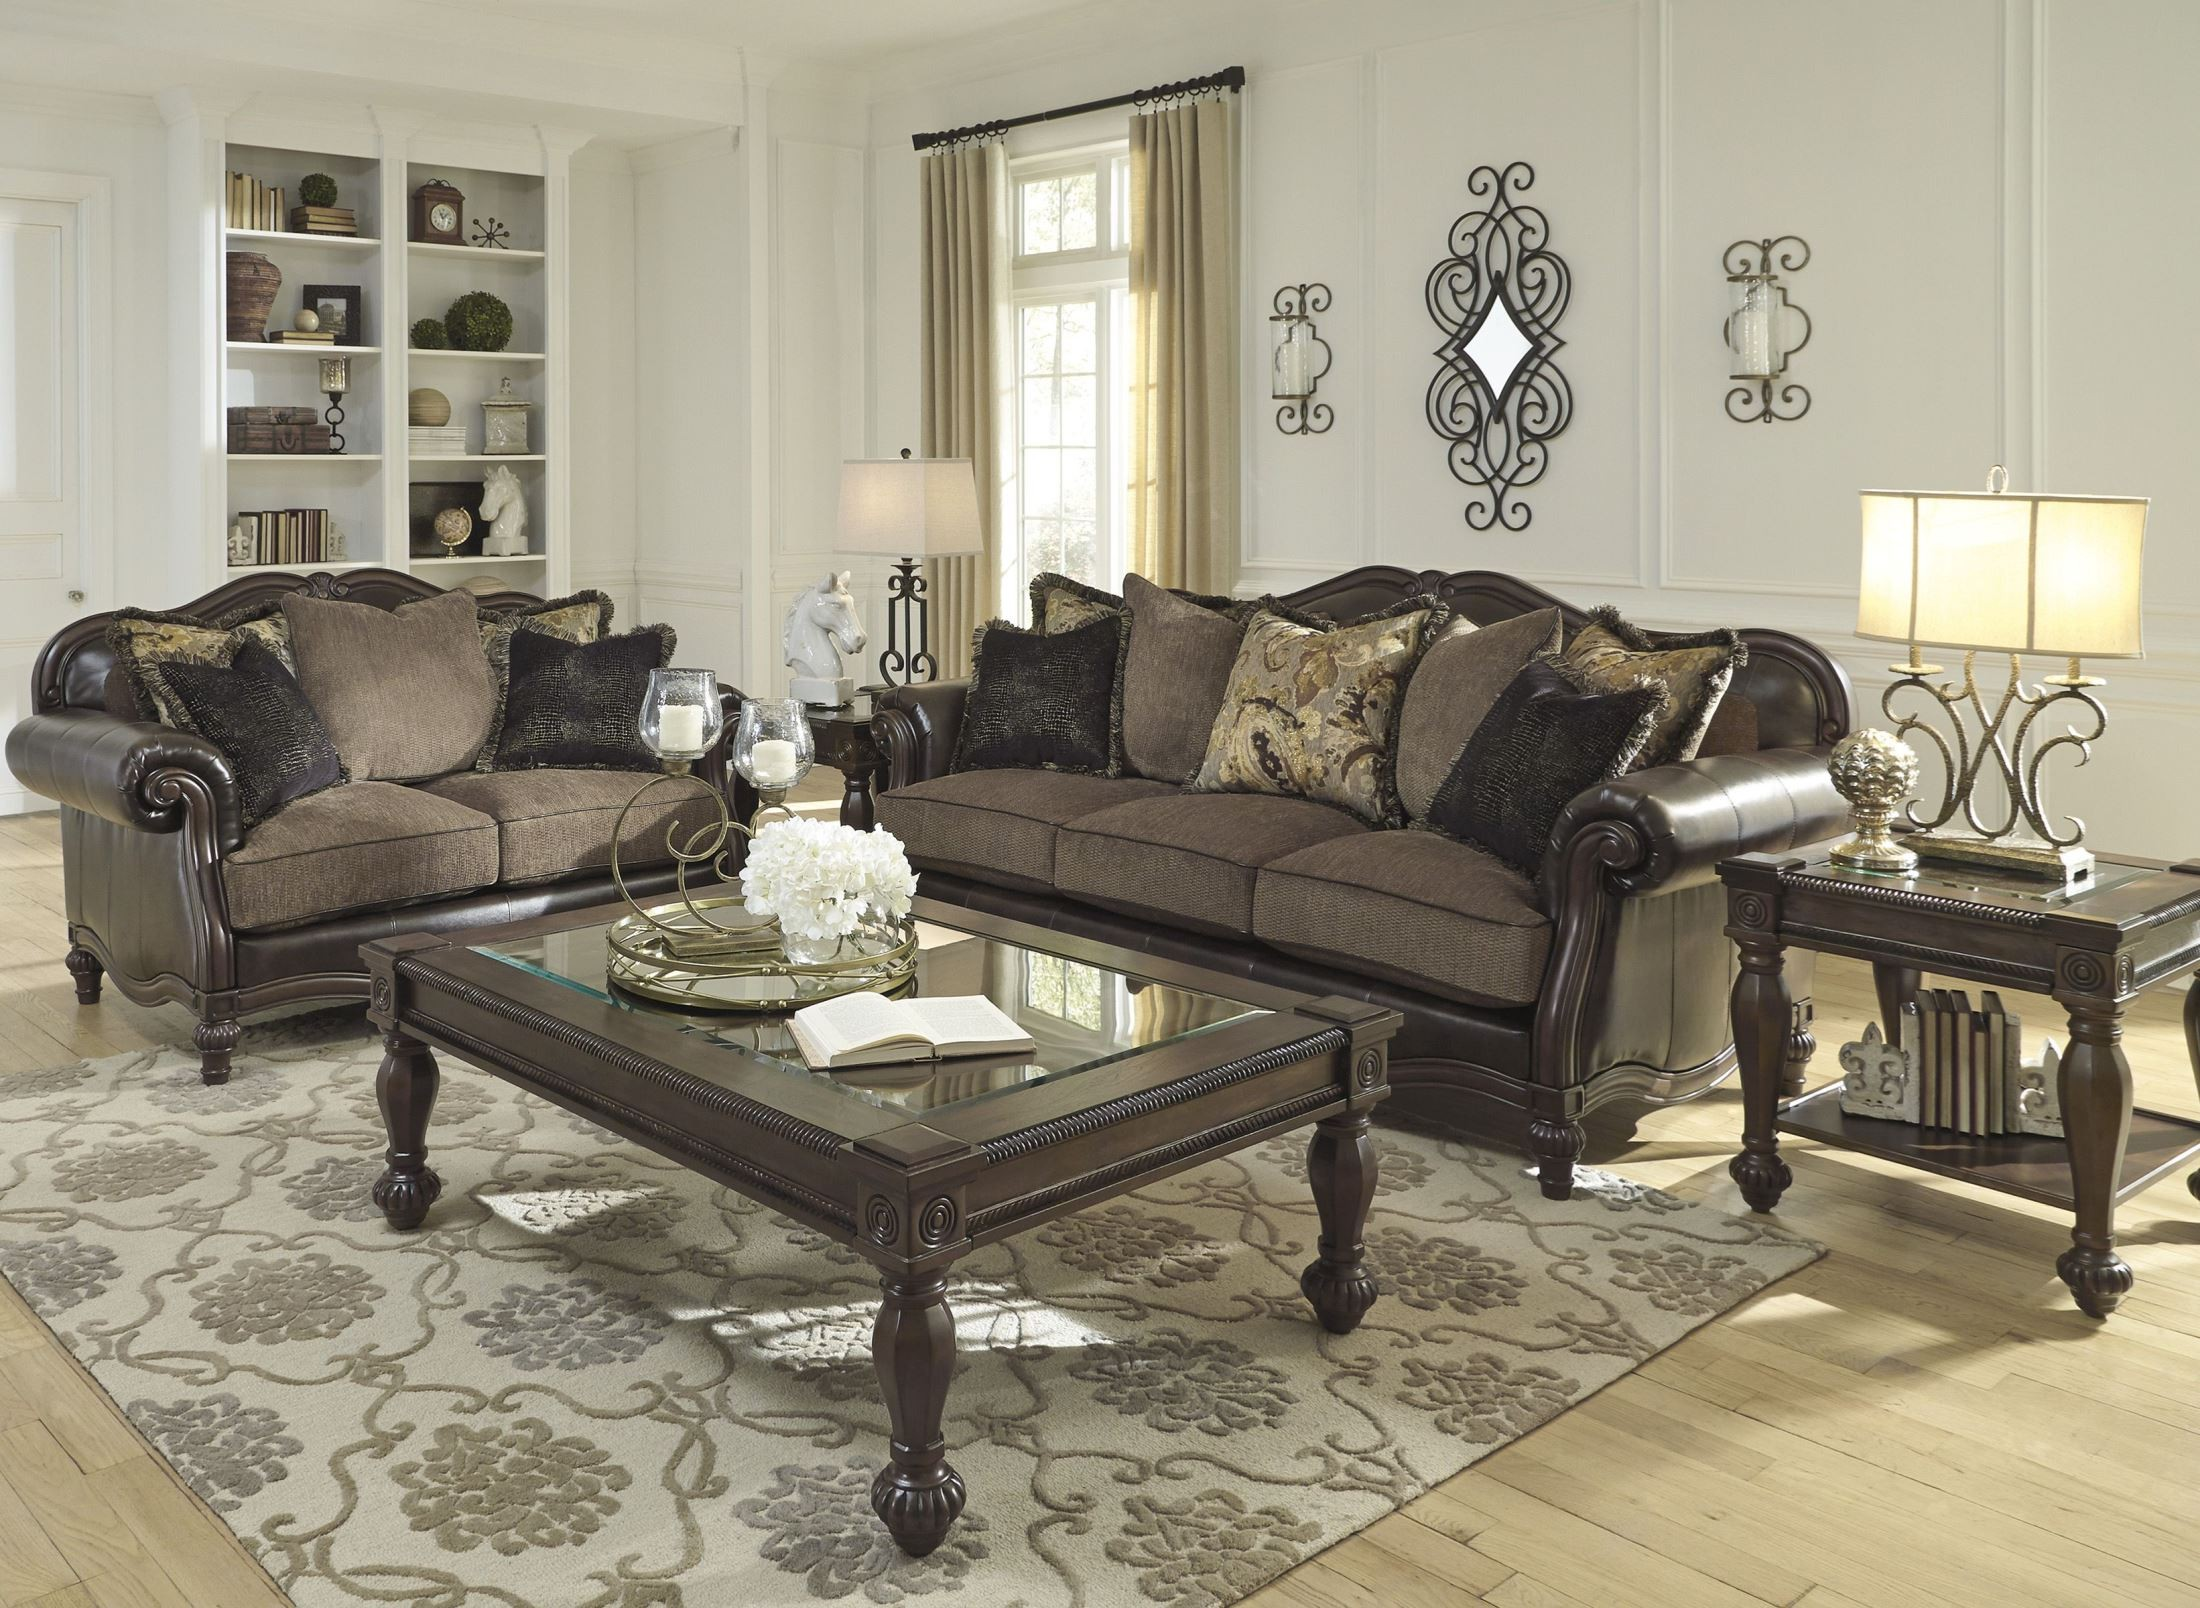 Winnsboro DuraBlend Vintage Living Room Set from Ashley Coleman